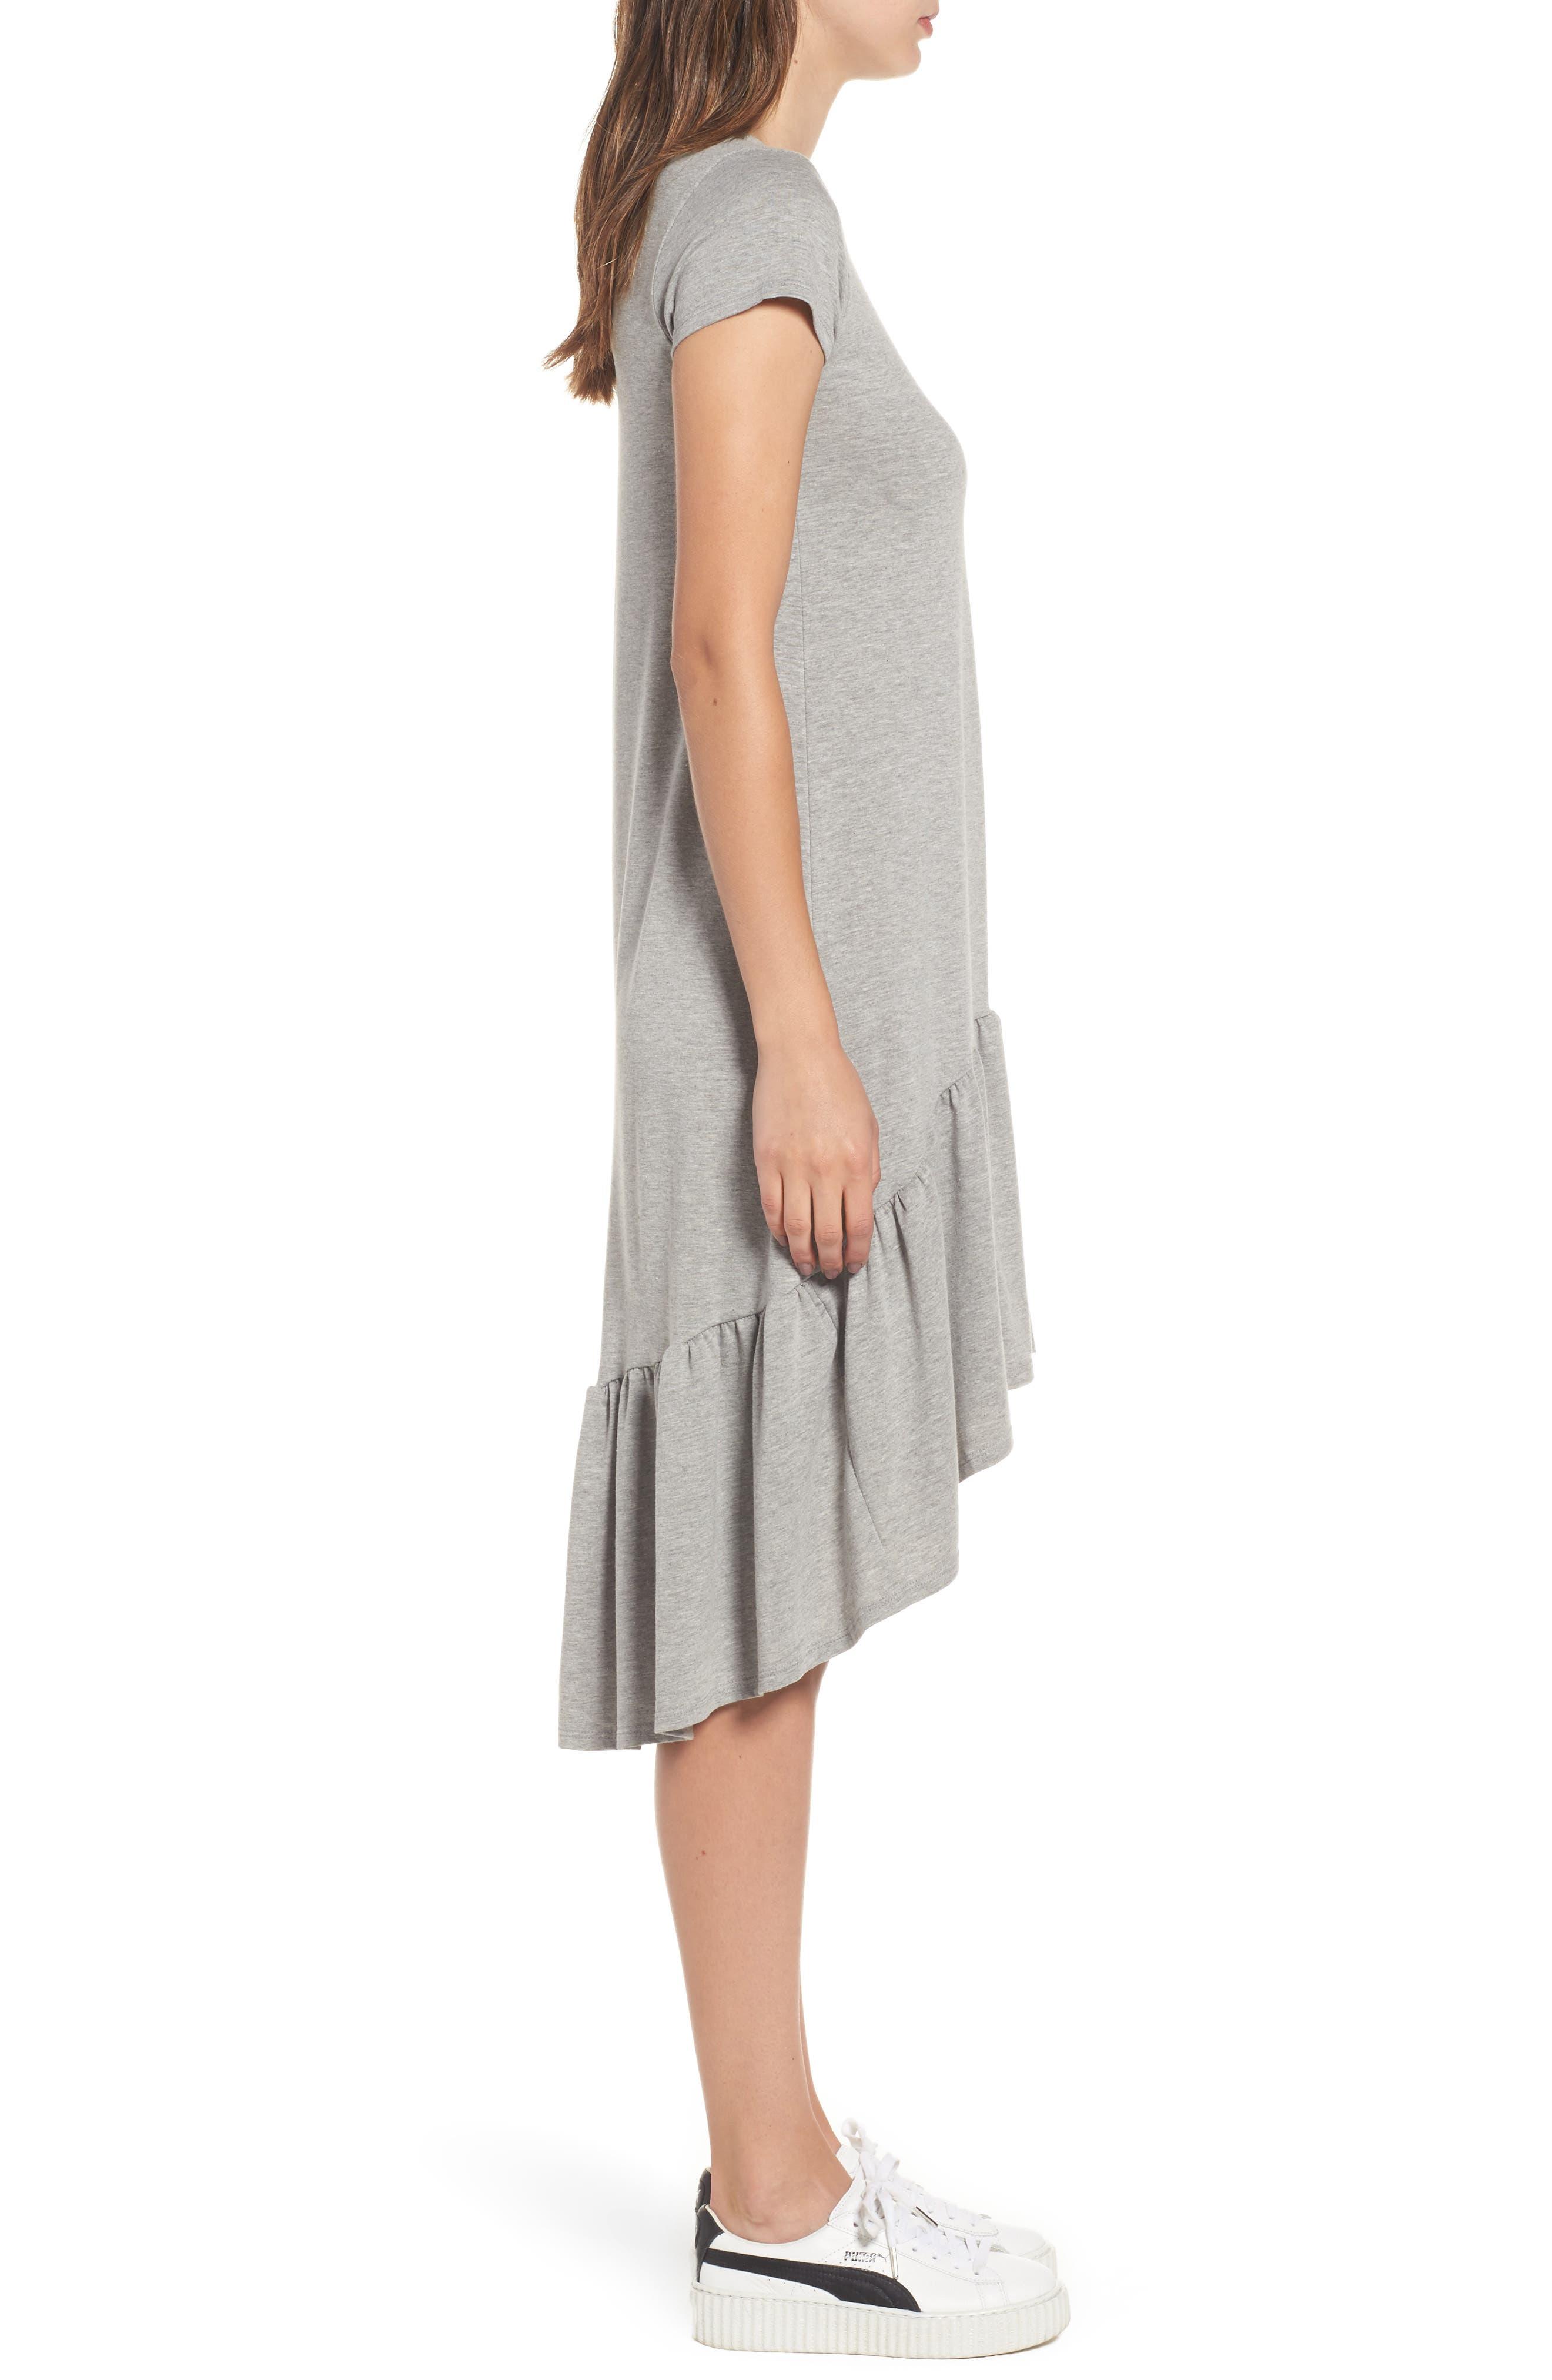 Alternate Image 3  - Cotton Emporium Ruffle Hem Knit T-Shirt Dress